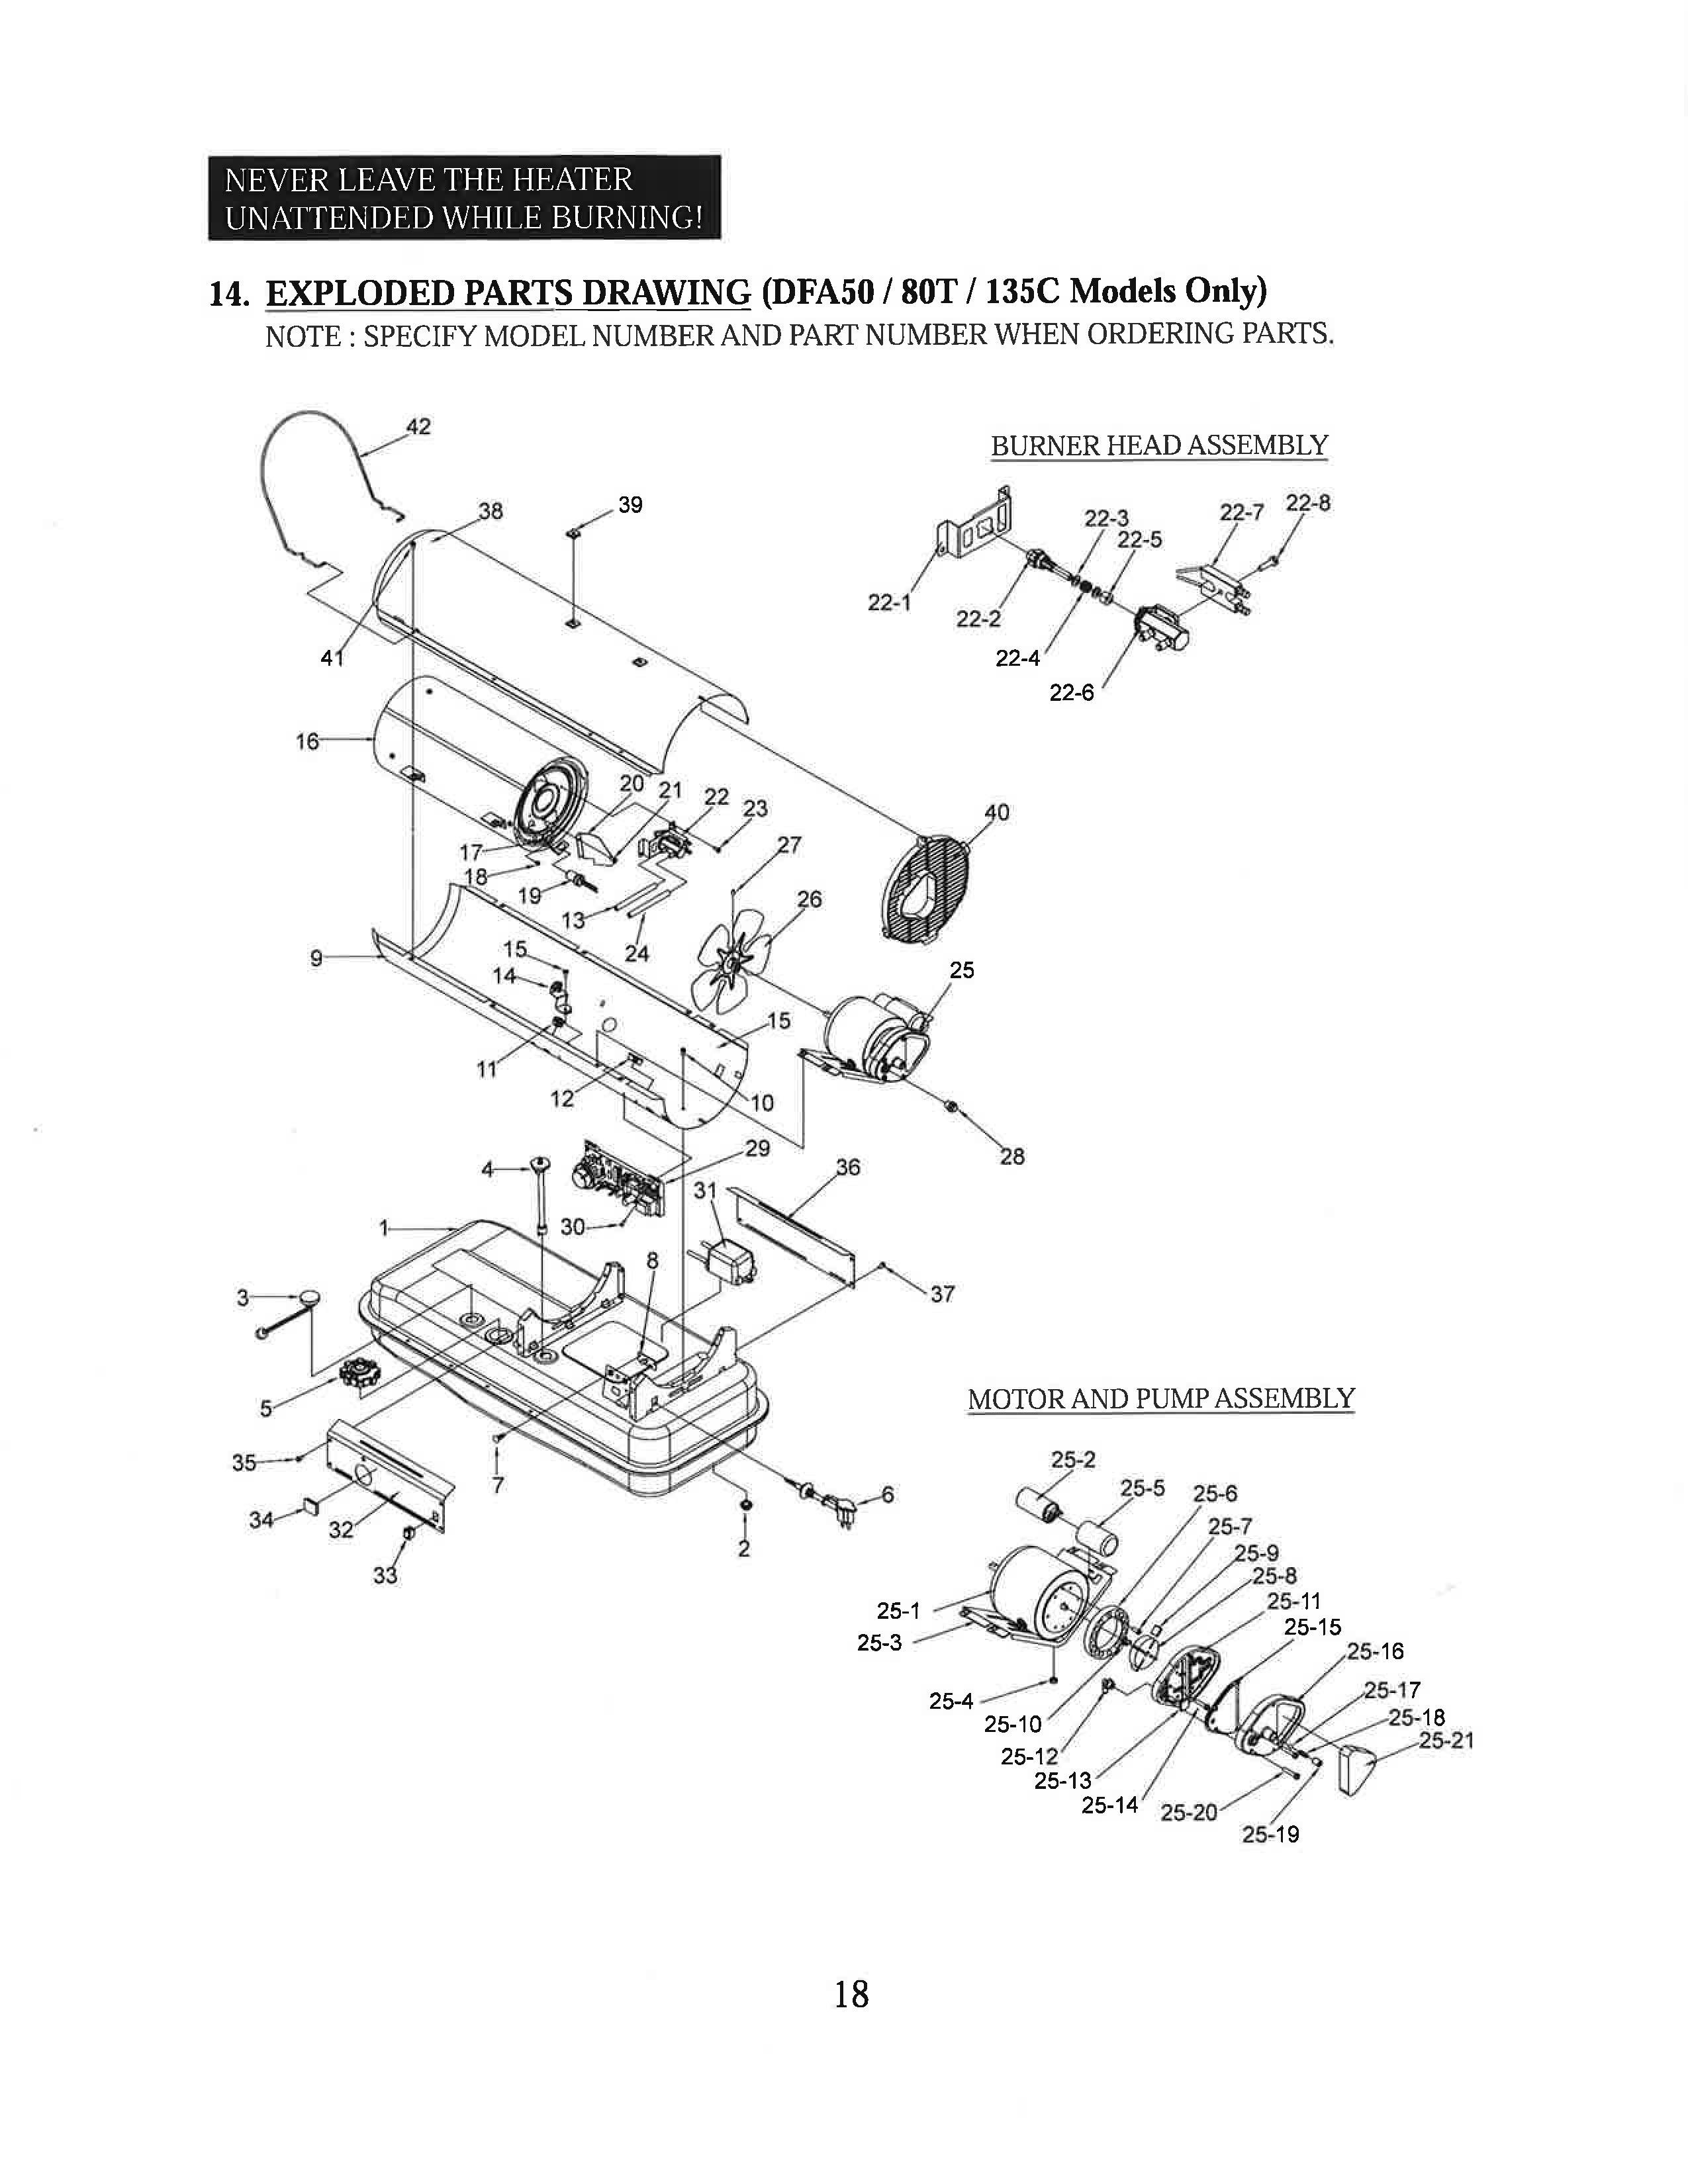 Dura Heat Dfa135c 135 000 Btu Kero Forced Air Heater With